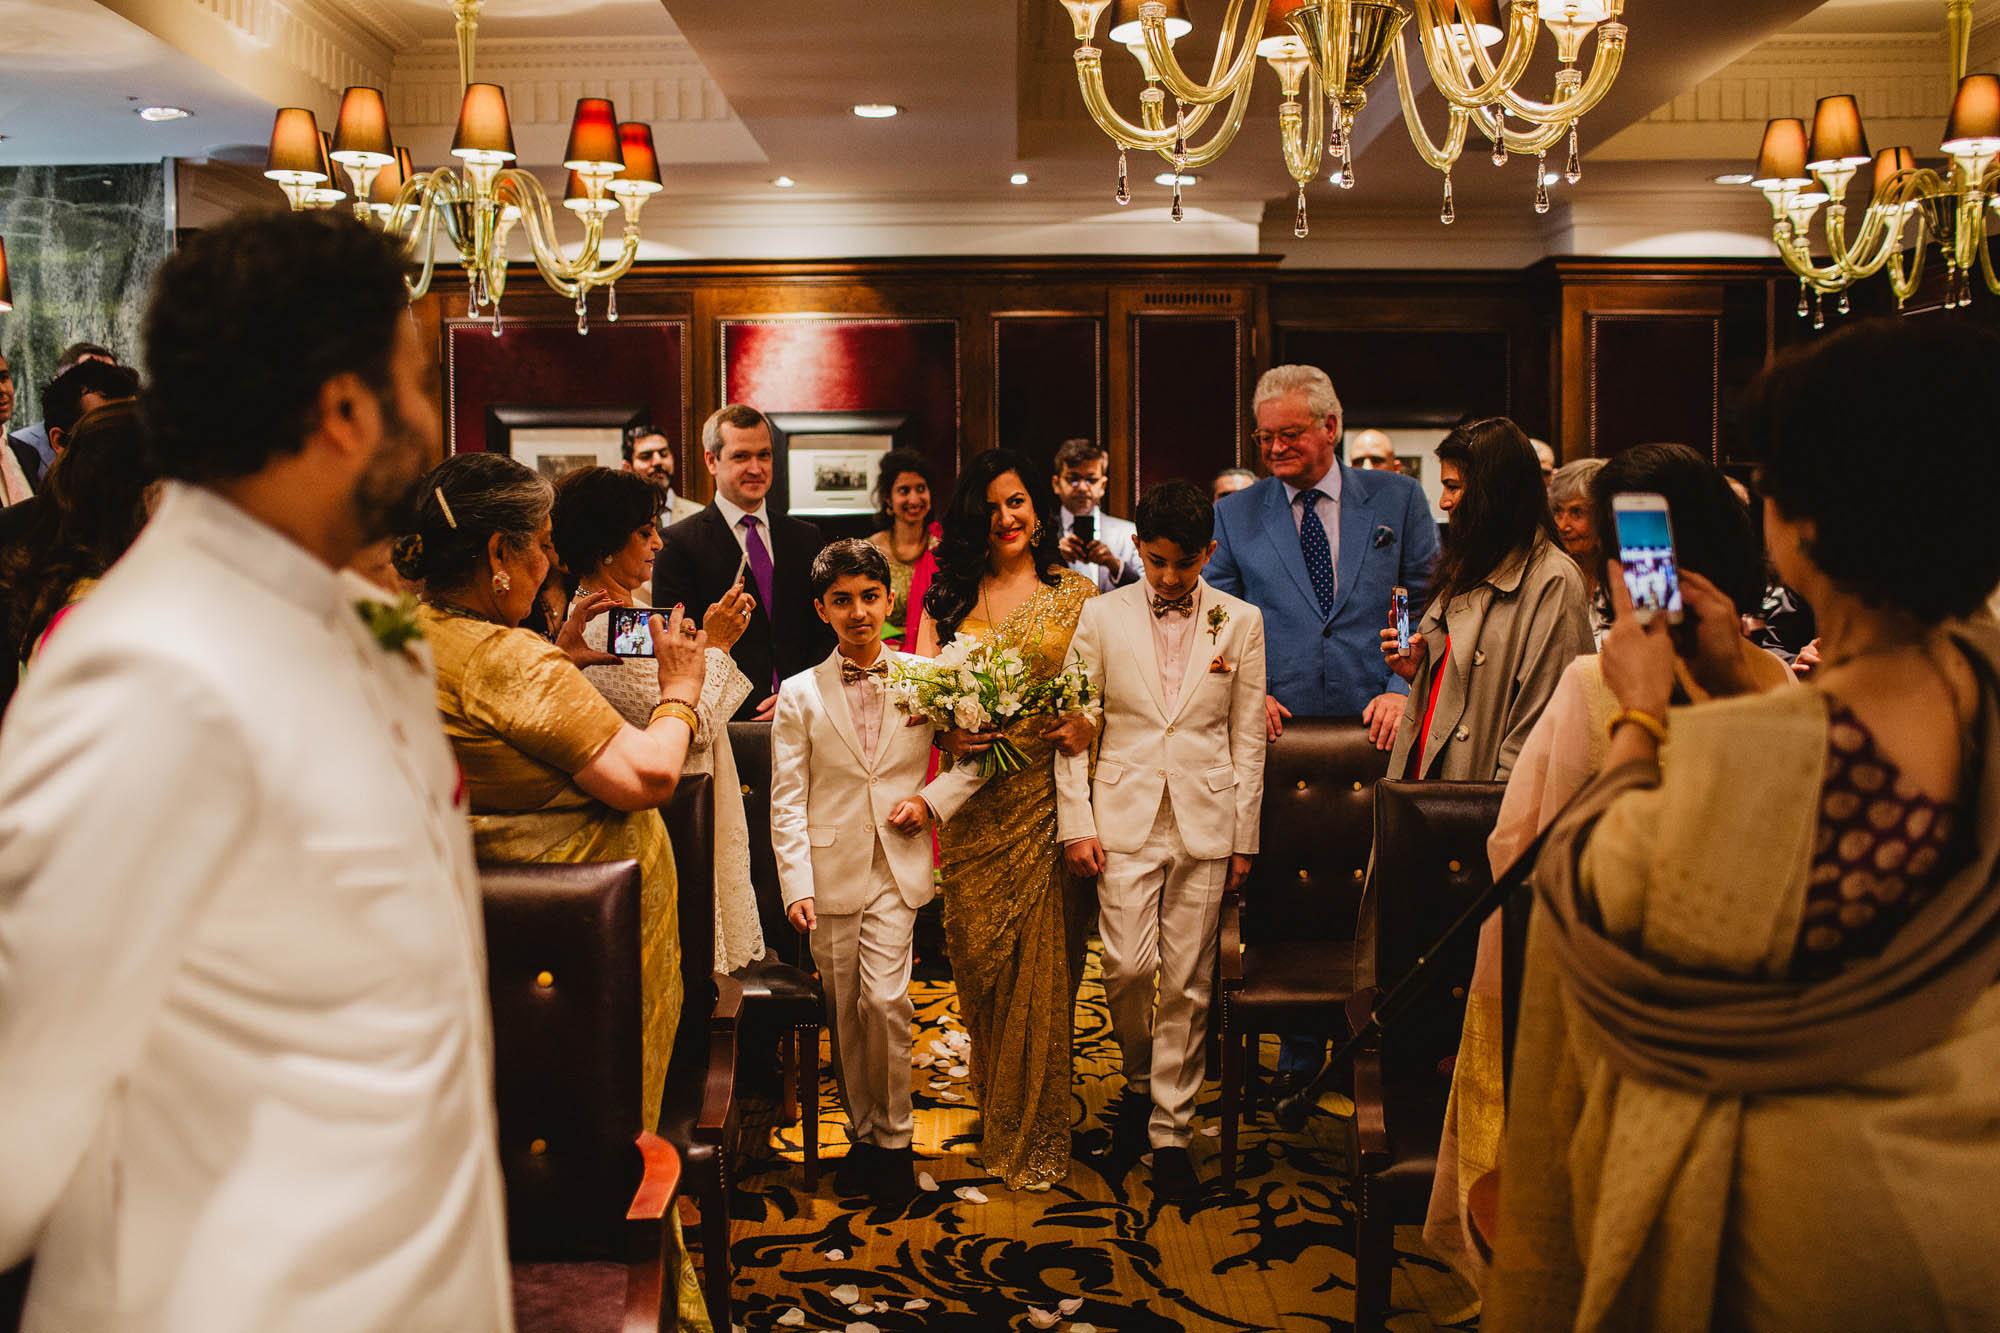 Goring hotel London wedding 14